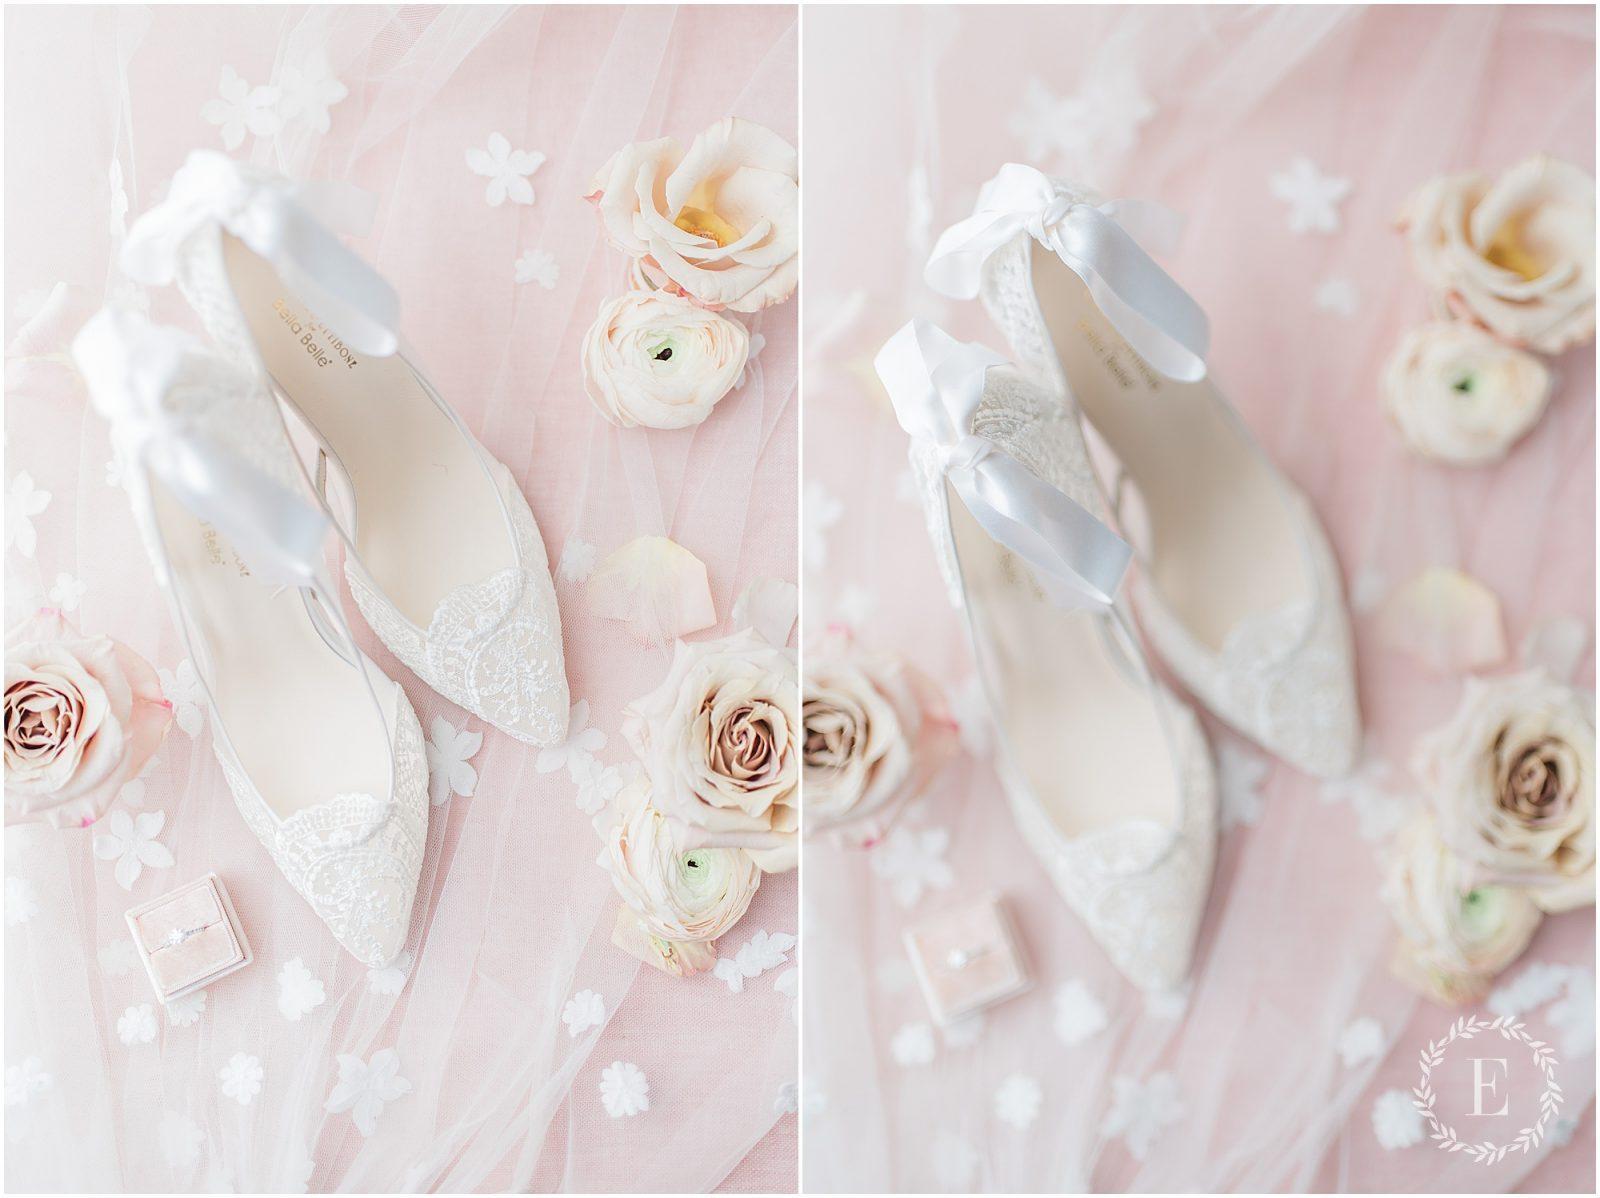 7 - Bella Belle for Fairy Dreams Bridal - PhotosbyEmmaH 2019.jpg